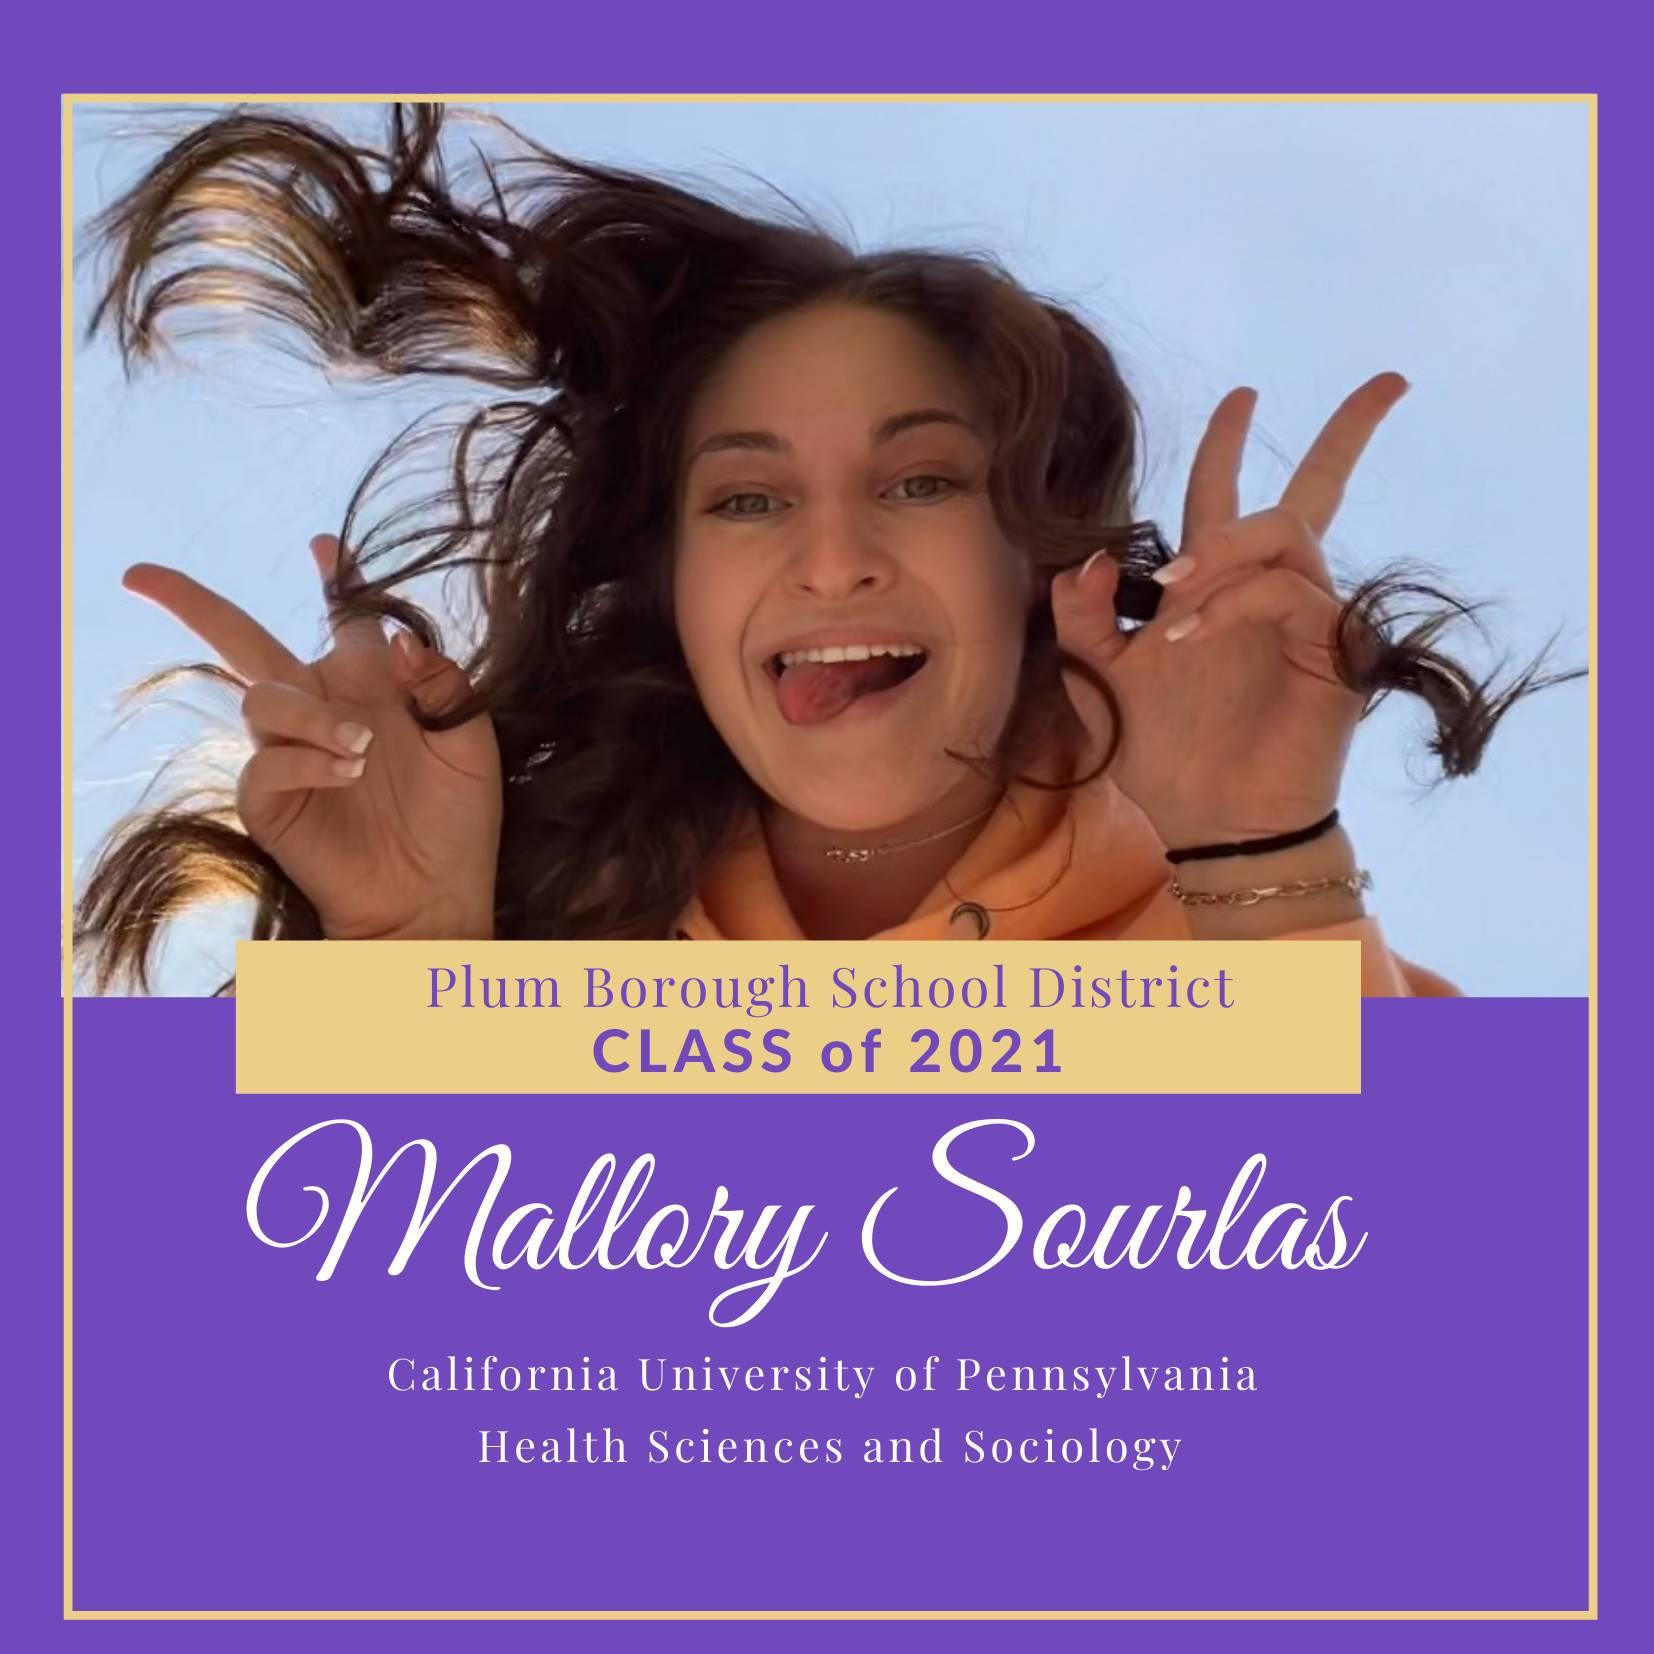 Congratulations to Mallory Sourlas, Class of 2021!